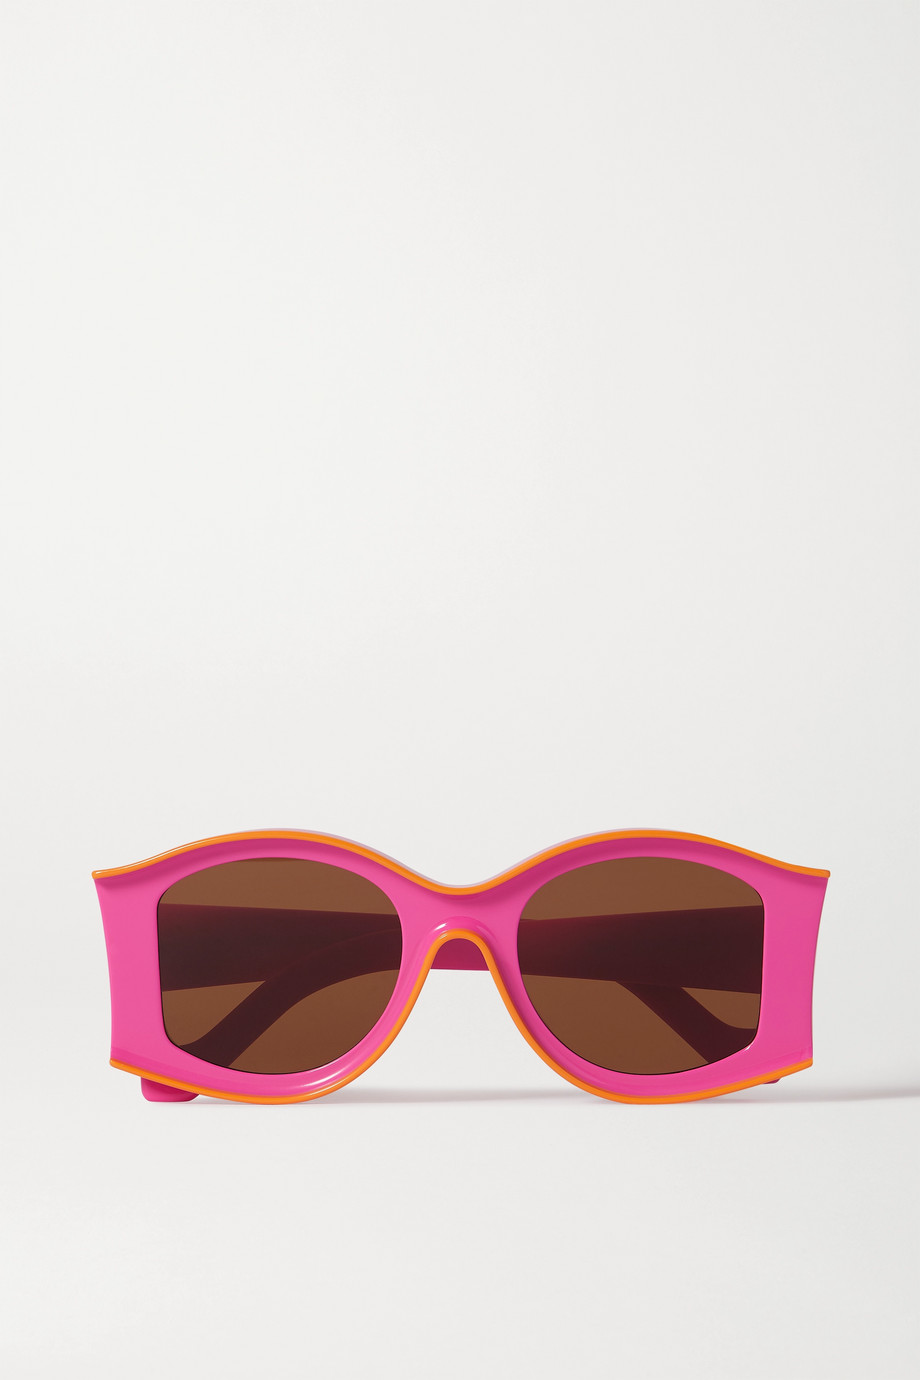 Loewe + Paula's Ibiza Sonnenbrille mit rundem Rahmen aus Azetat